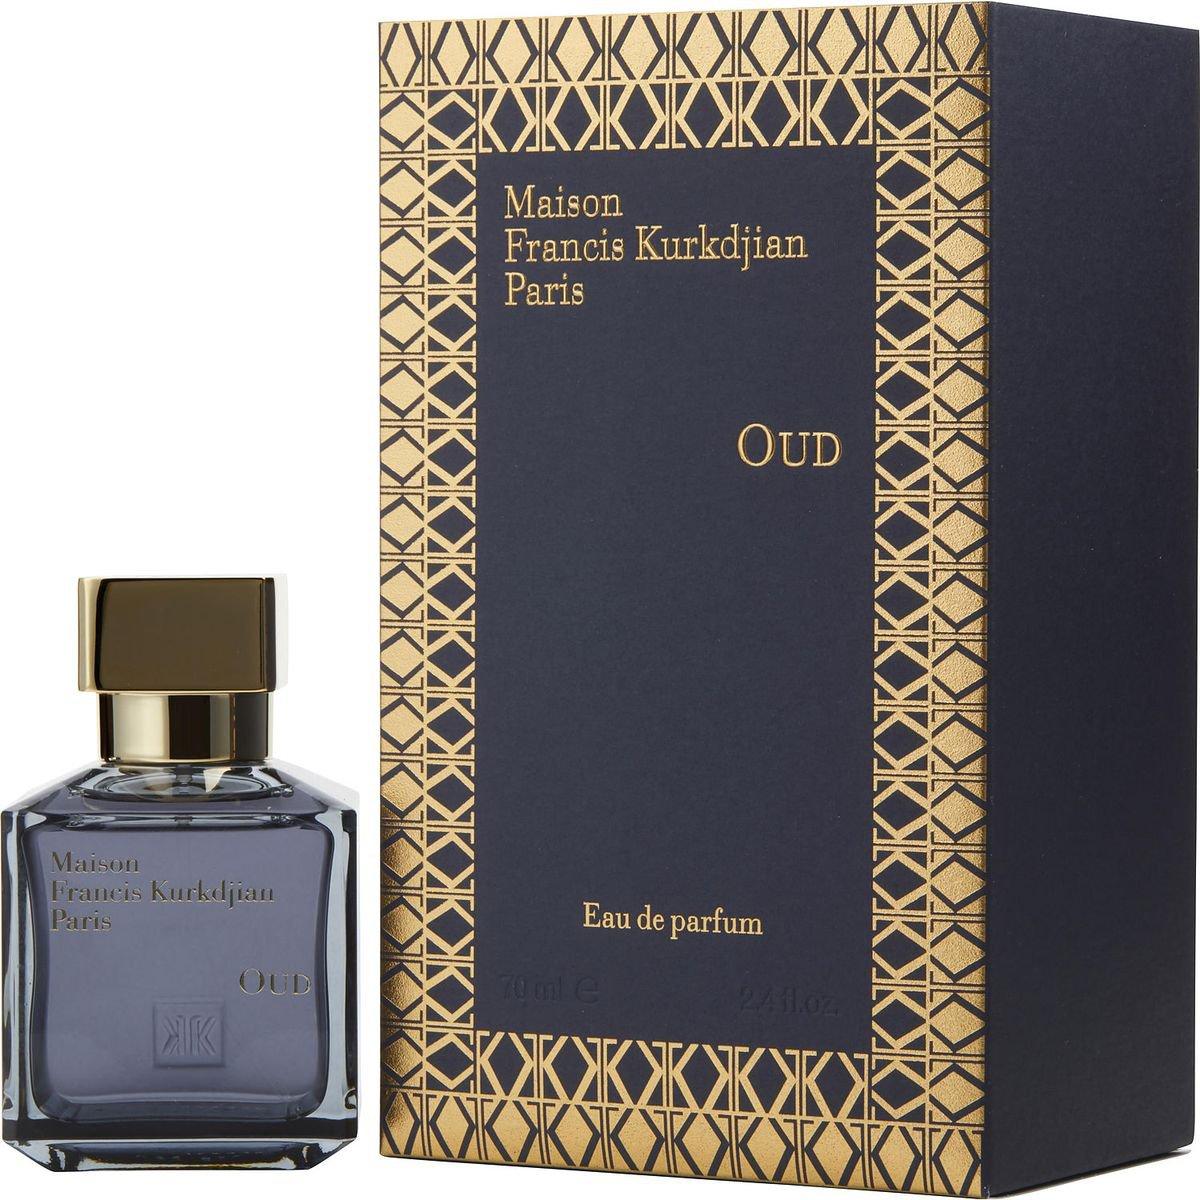 Maison Francis Kurkdjian Oud Eau de Parfum 2.4 oz Spray.